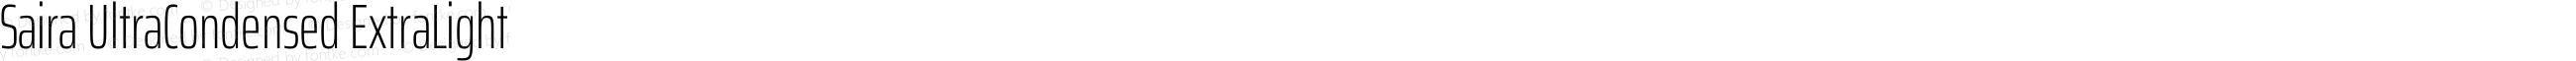 Saira UltraCondensed ExtraLight